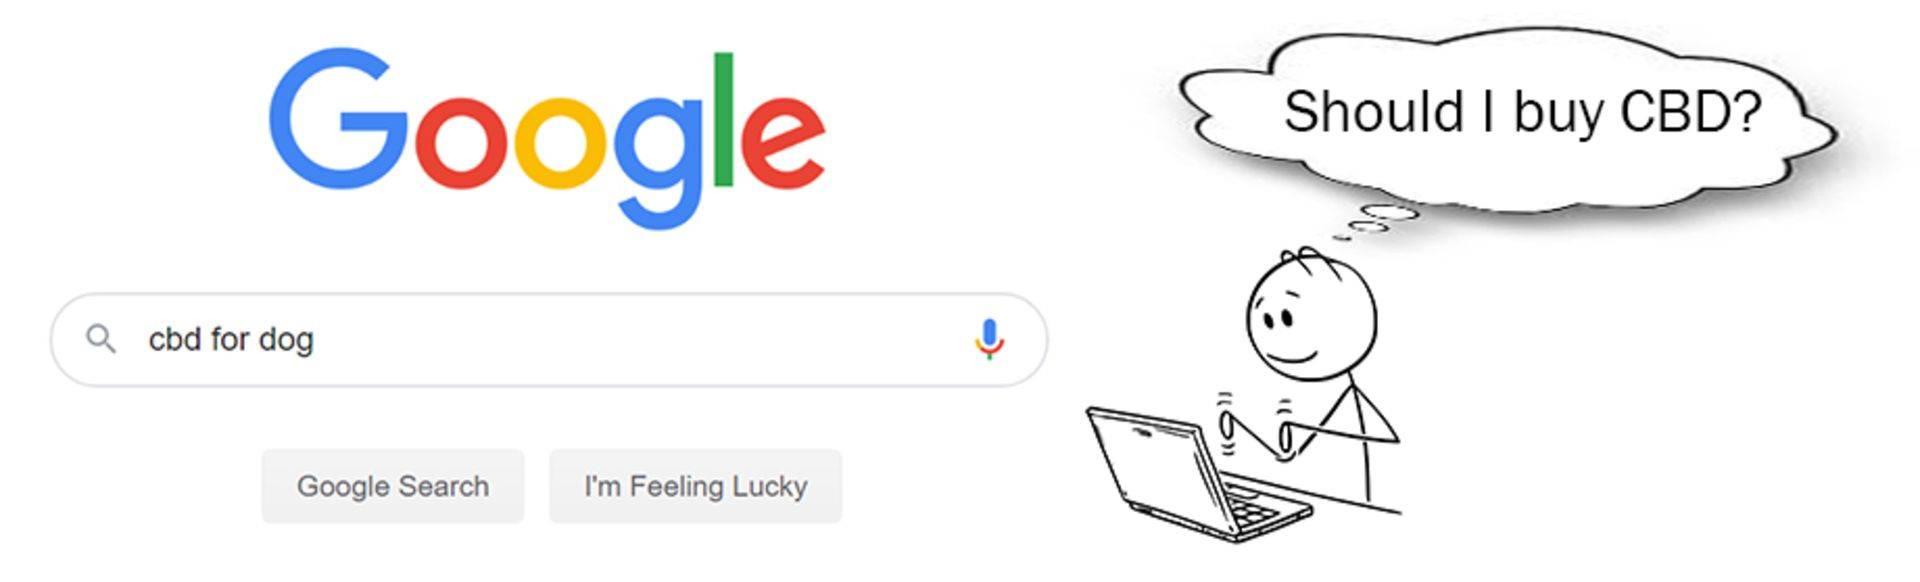 cbd google search